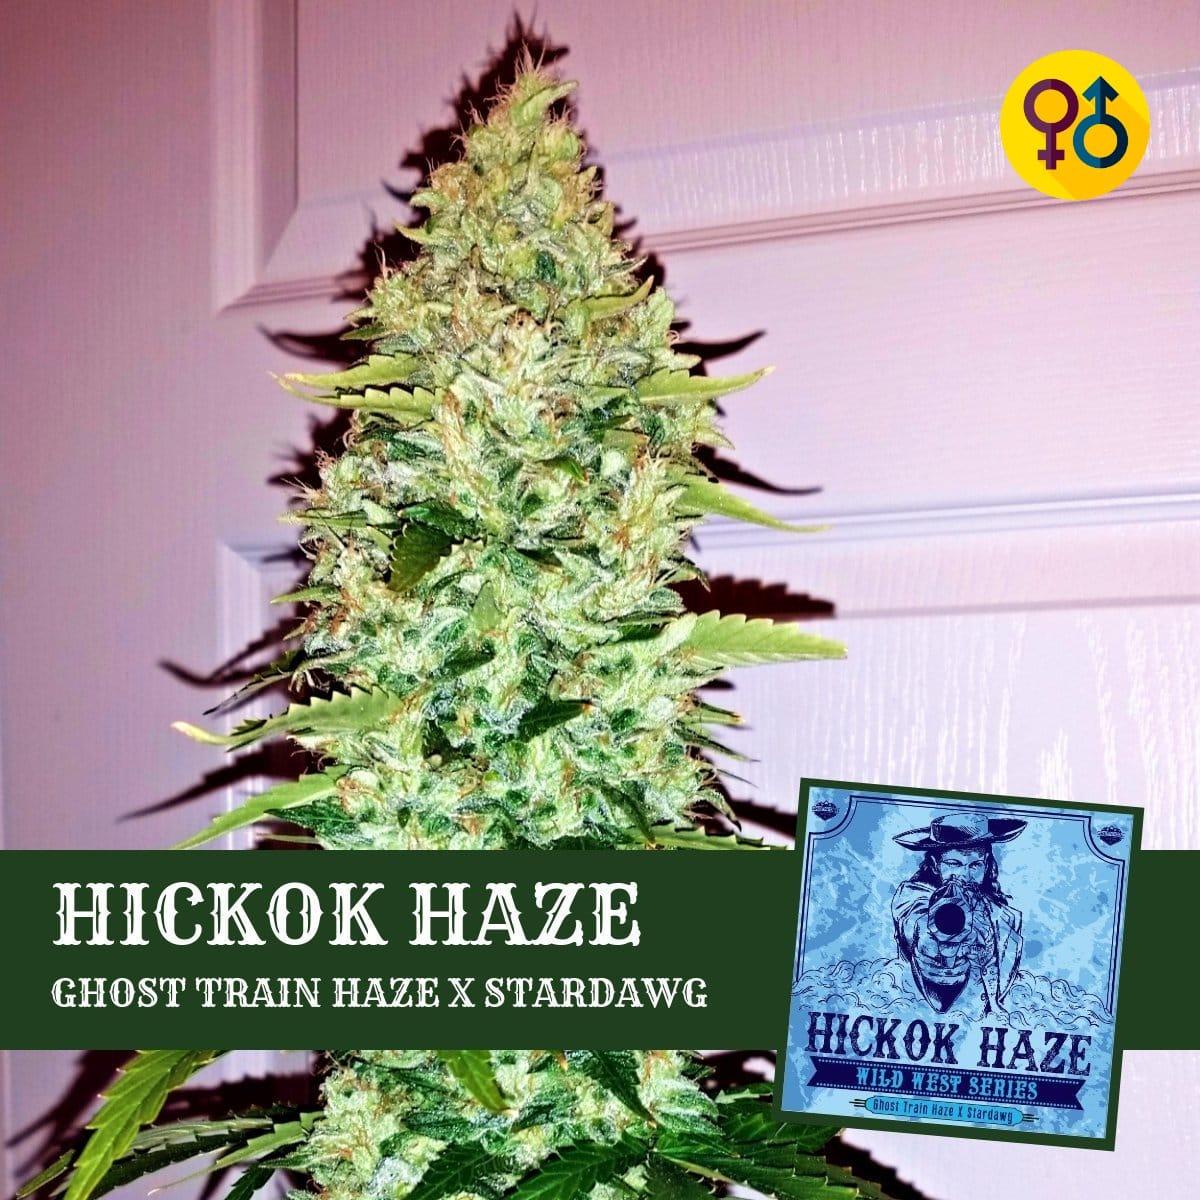 Hickok Haze - Ghost Train Haze X Stardawg   Greenpoint Seeds